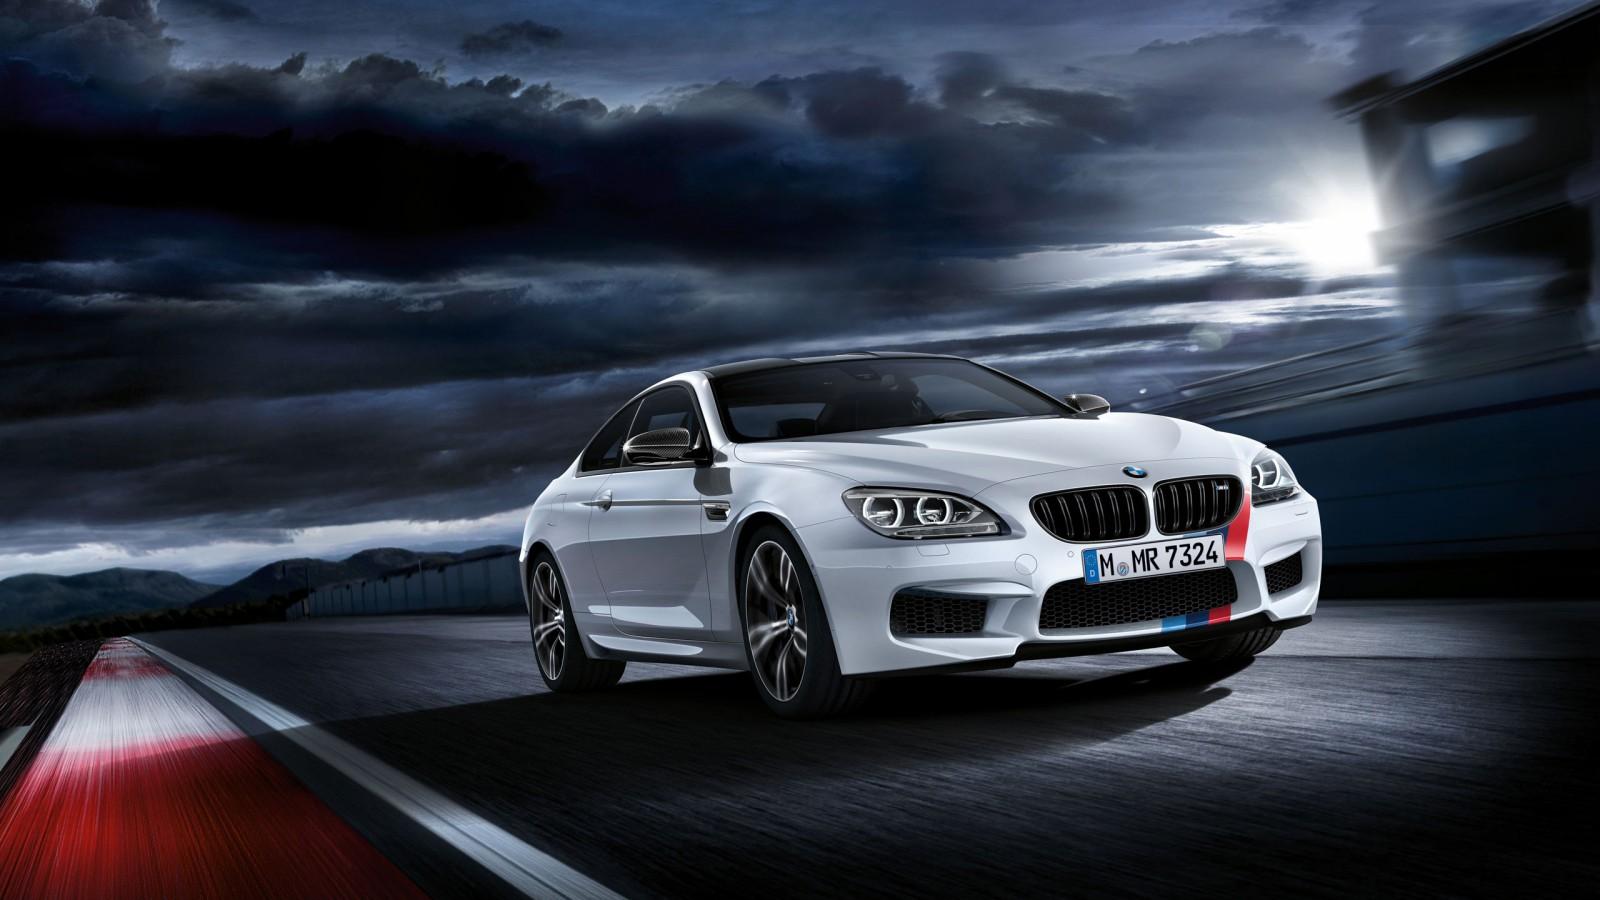 2013 BMW M6 Wallpaper | HD Car Wallpapers